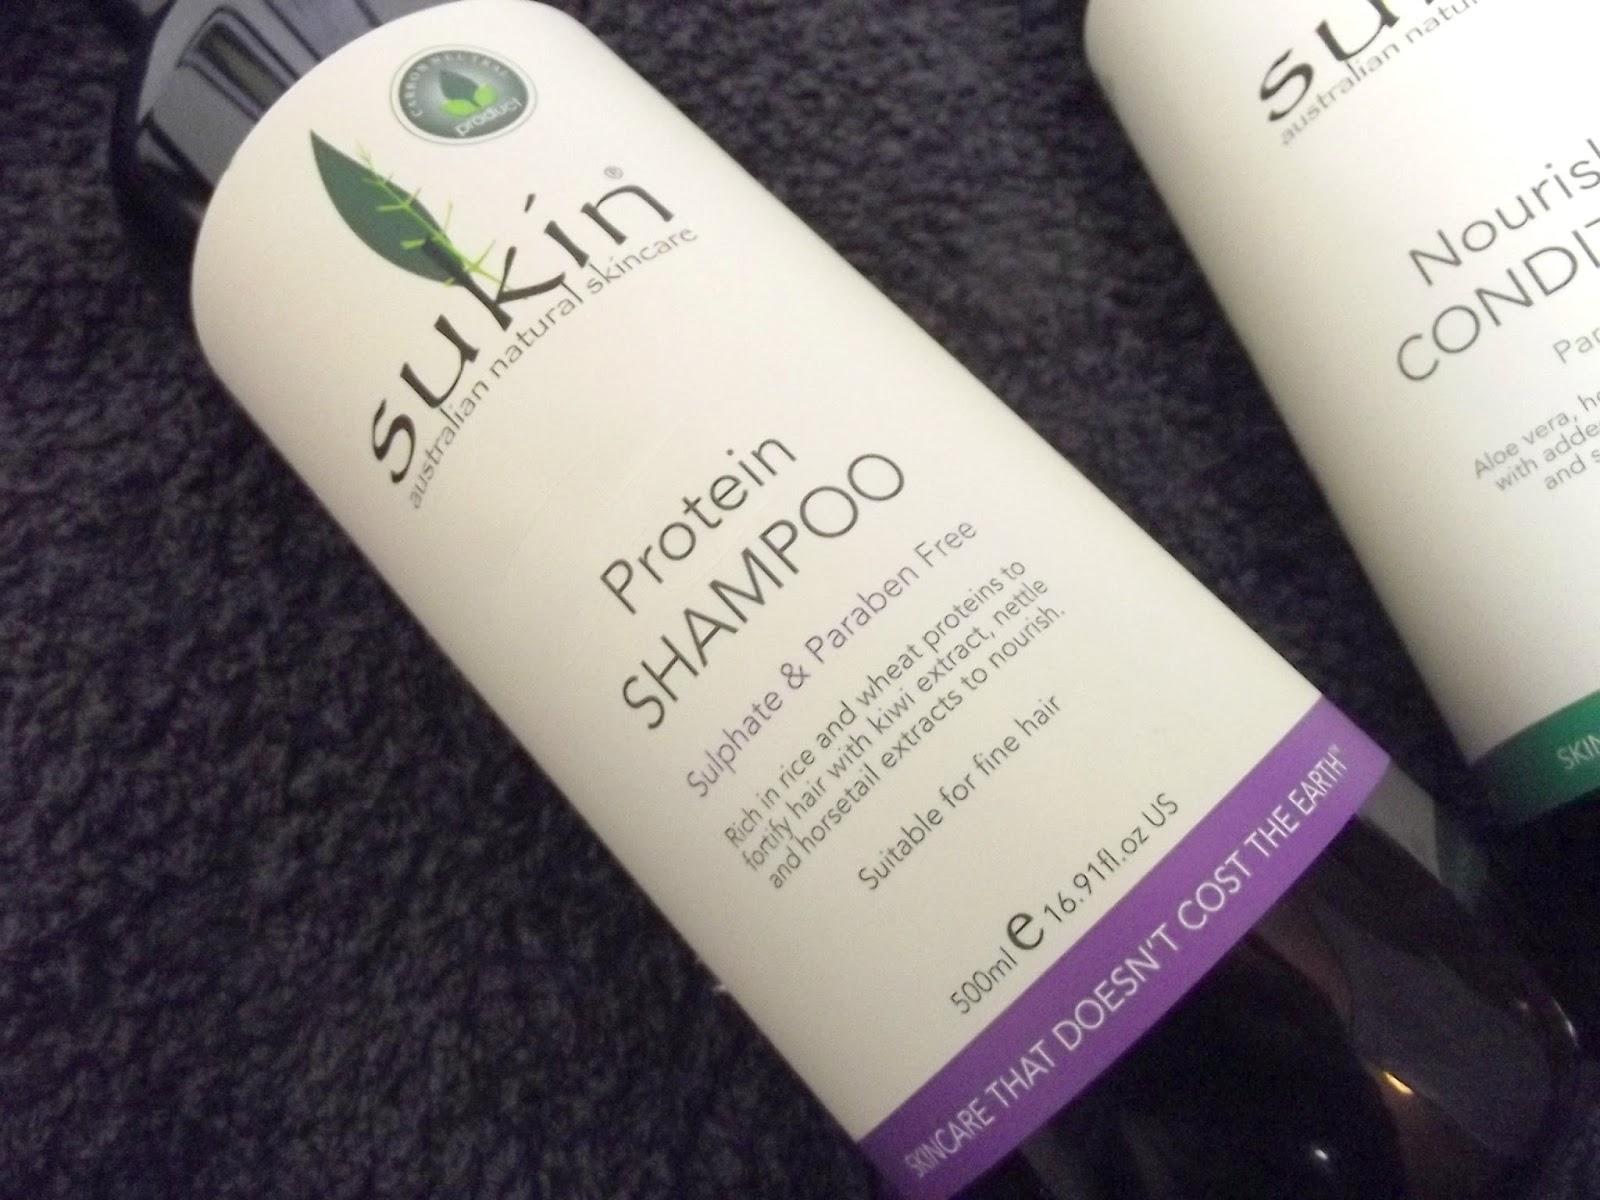 Sukin Protein Shampoo